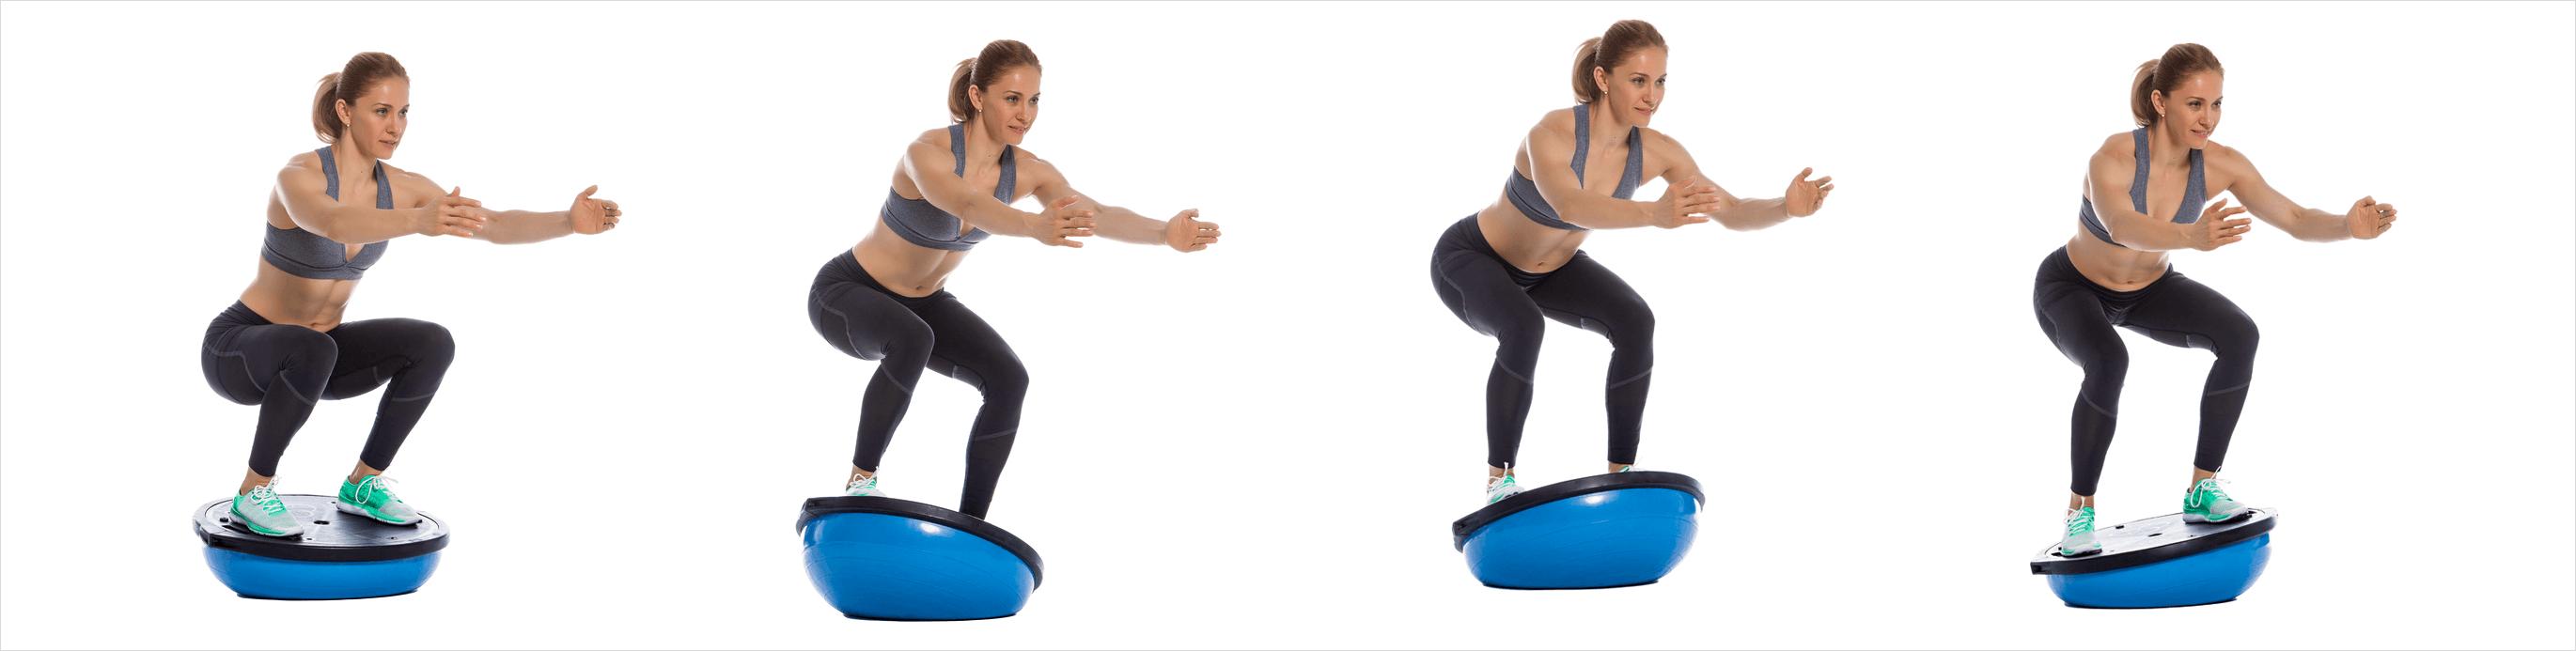 training-balance-trainer-bosu-1